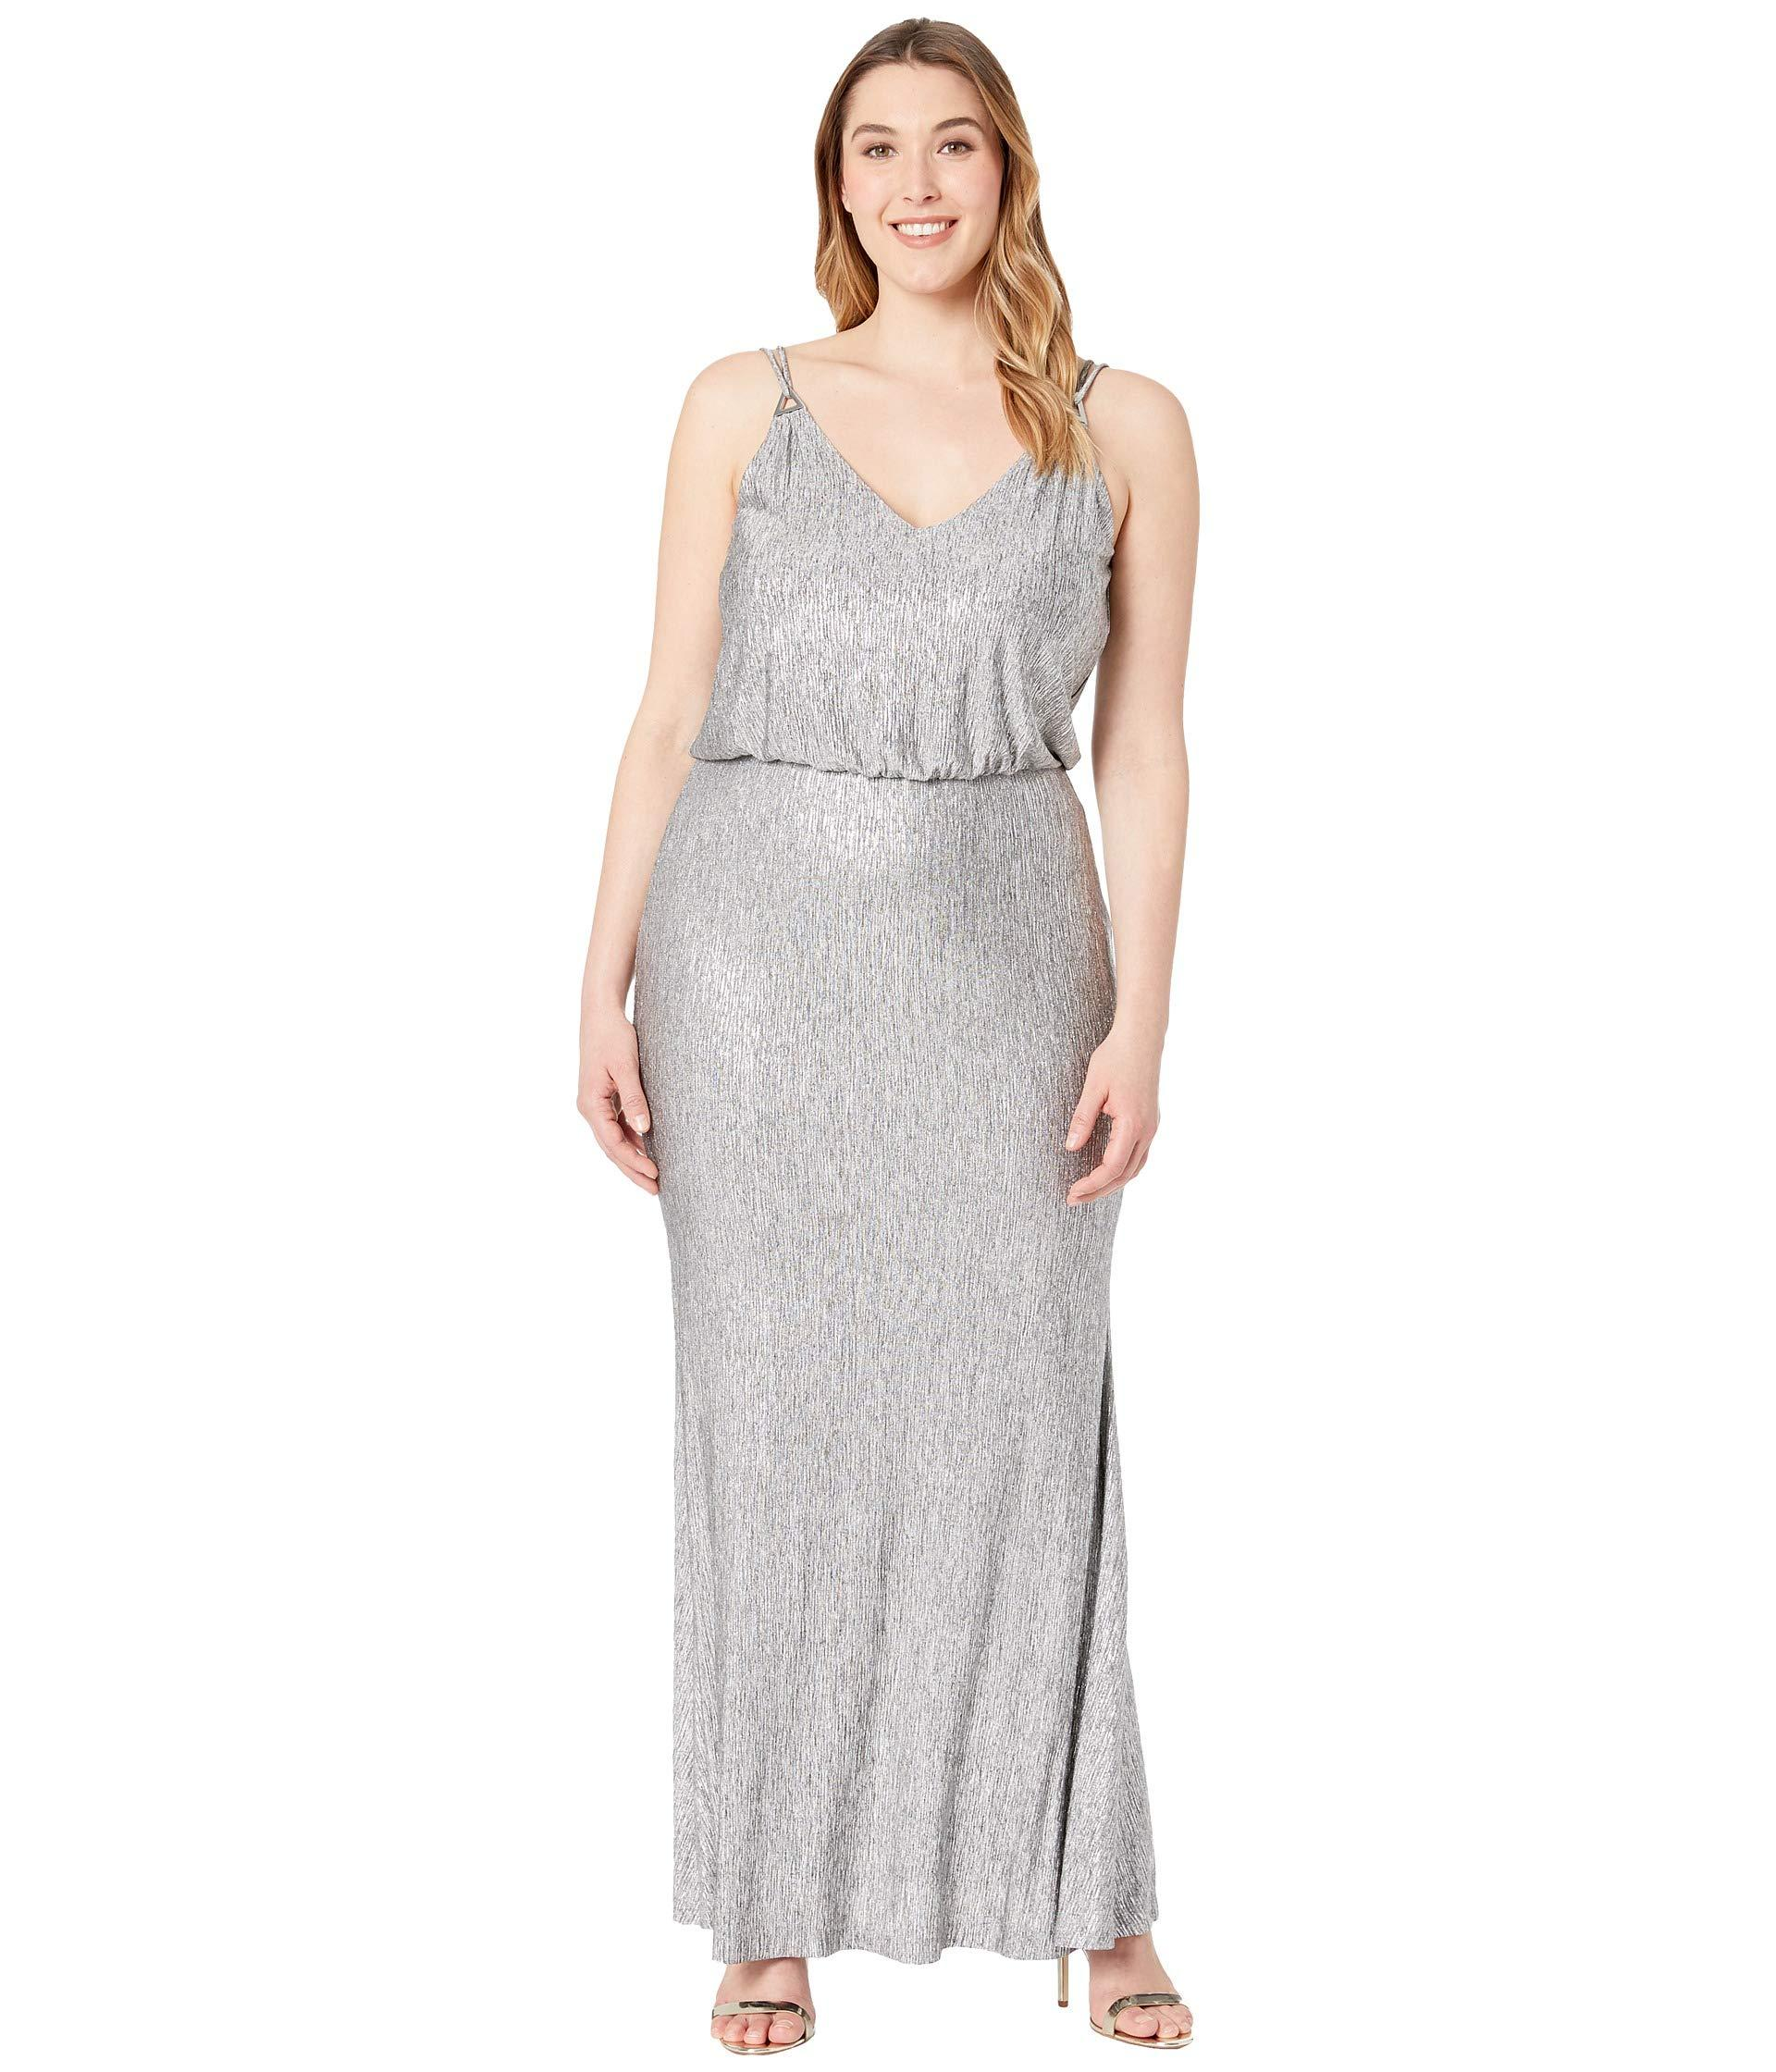 1cced40e0b1c6 Lyst - Calvin Klein Shimmer Blouson Gown Cd7b7p7e (grey Mutli ...